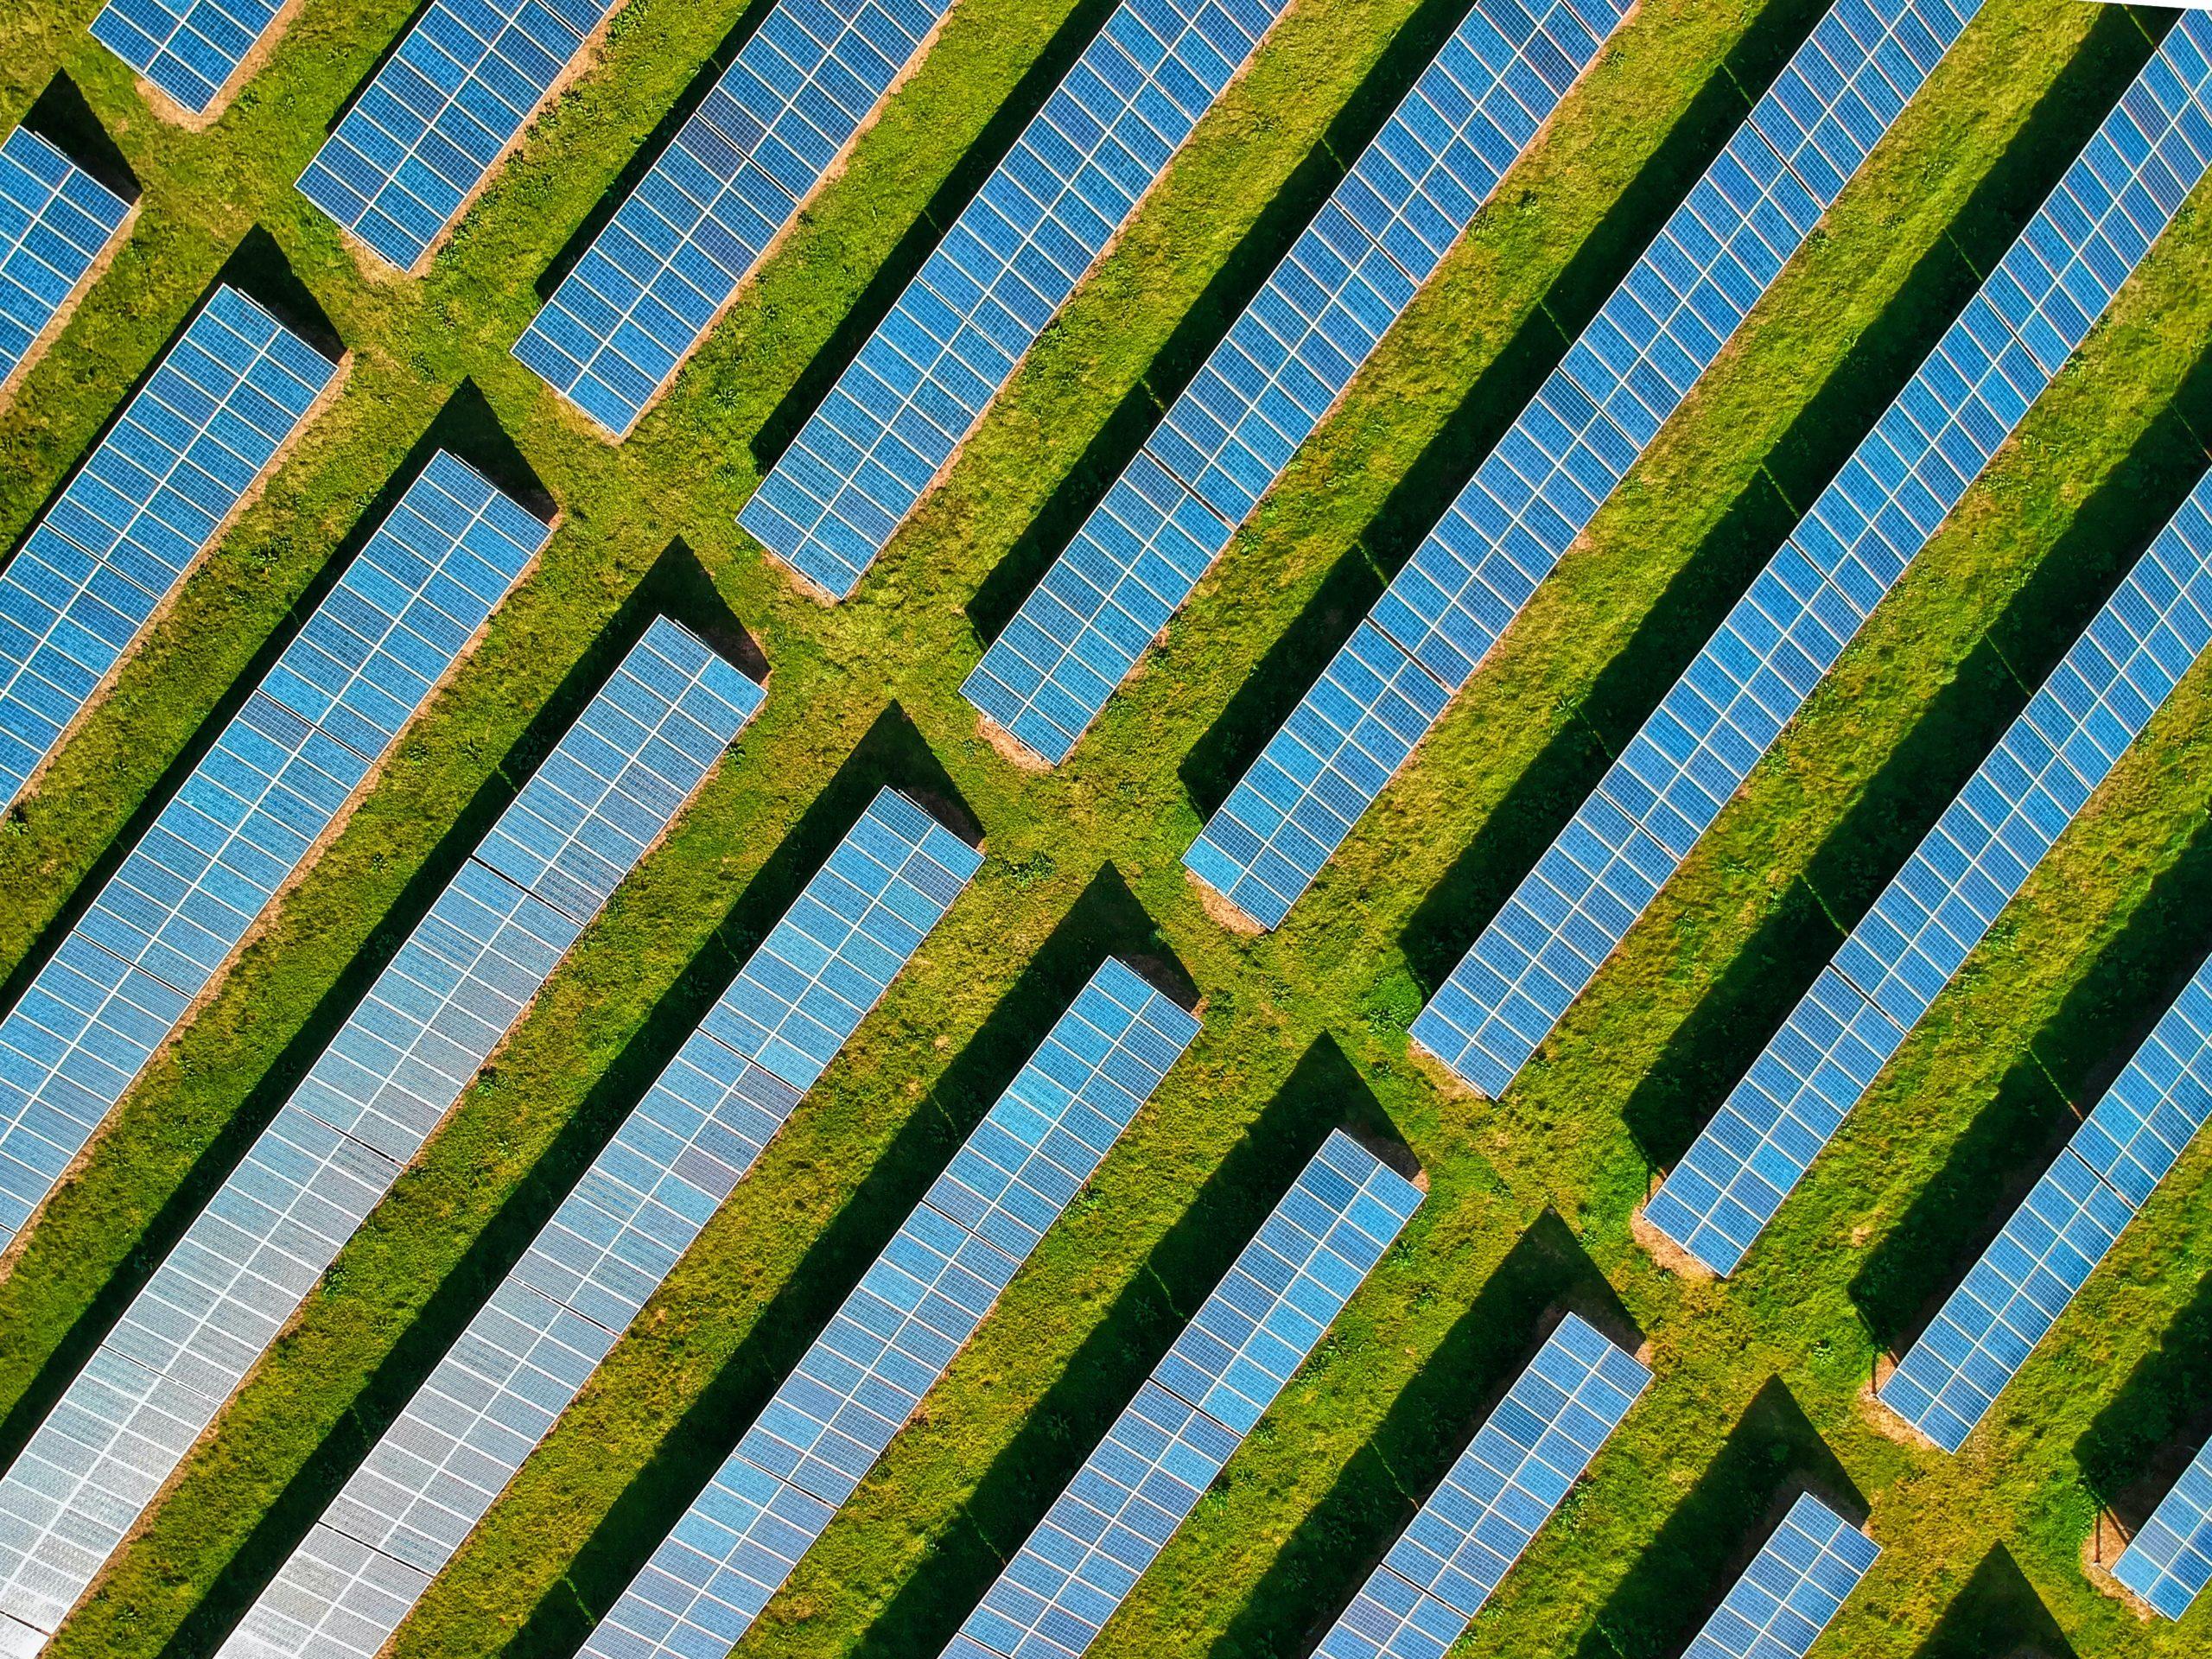 Lightsource bp targets 25 GW solar developments by 2025